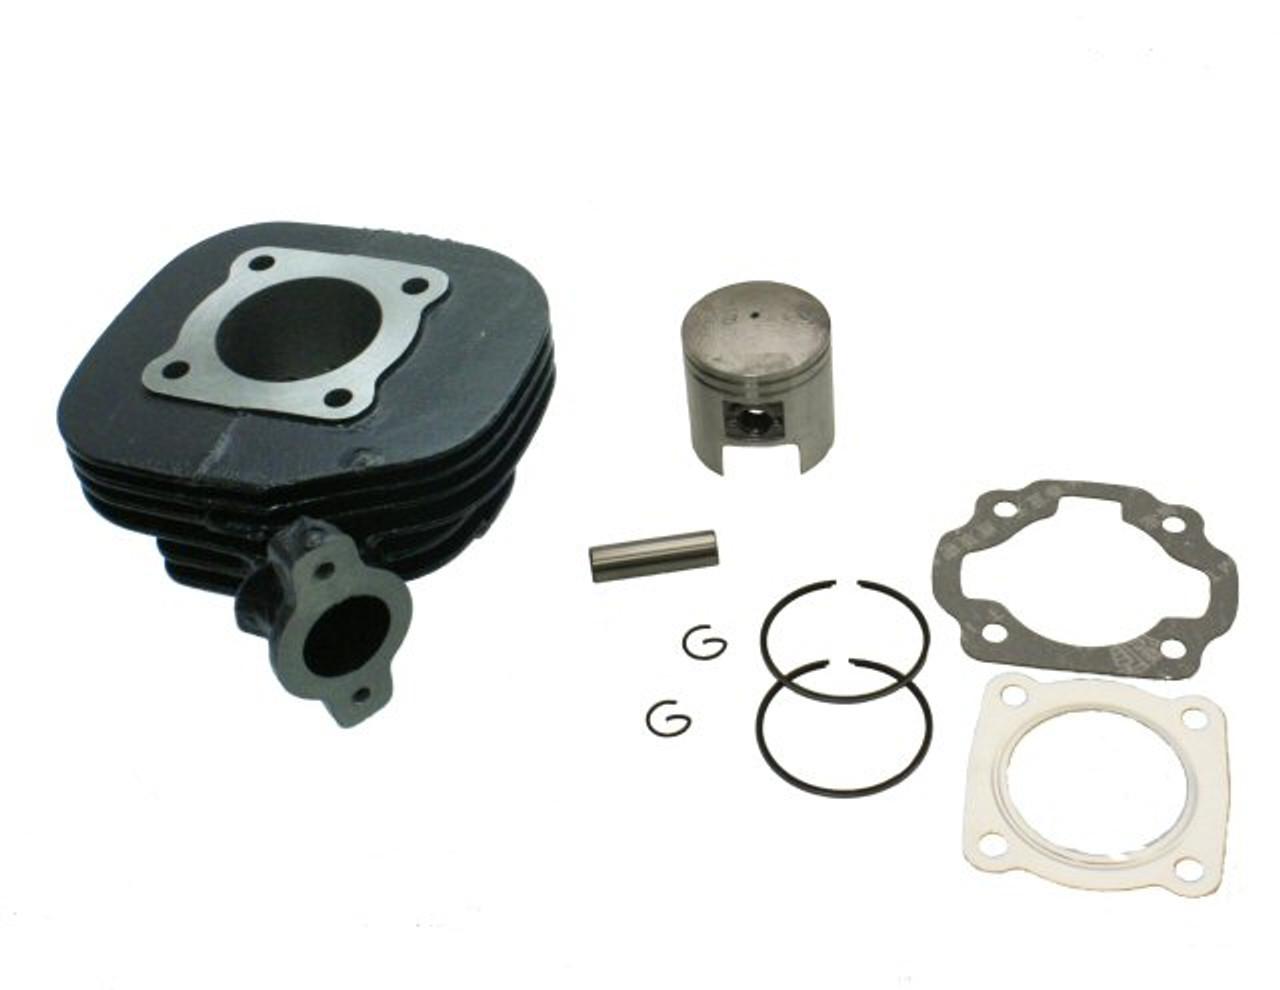 BIG BORE CYLINDER KIT TB60cc FOR 2-STROKE TB50cc 1DE41QMB ENGINES